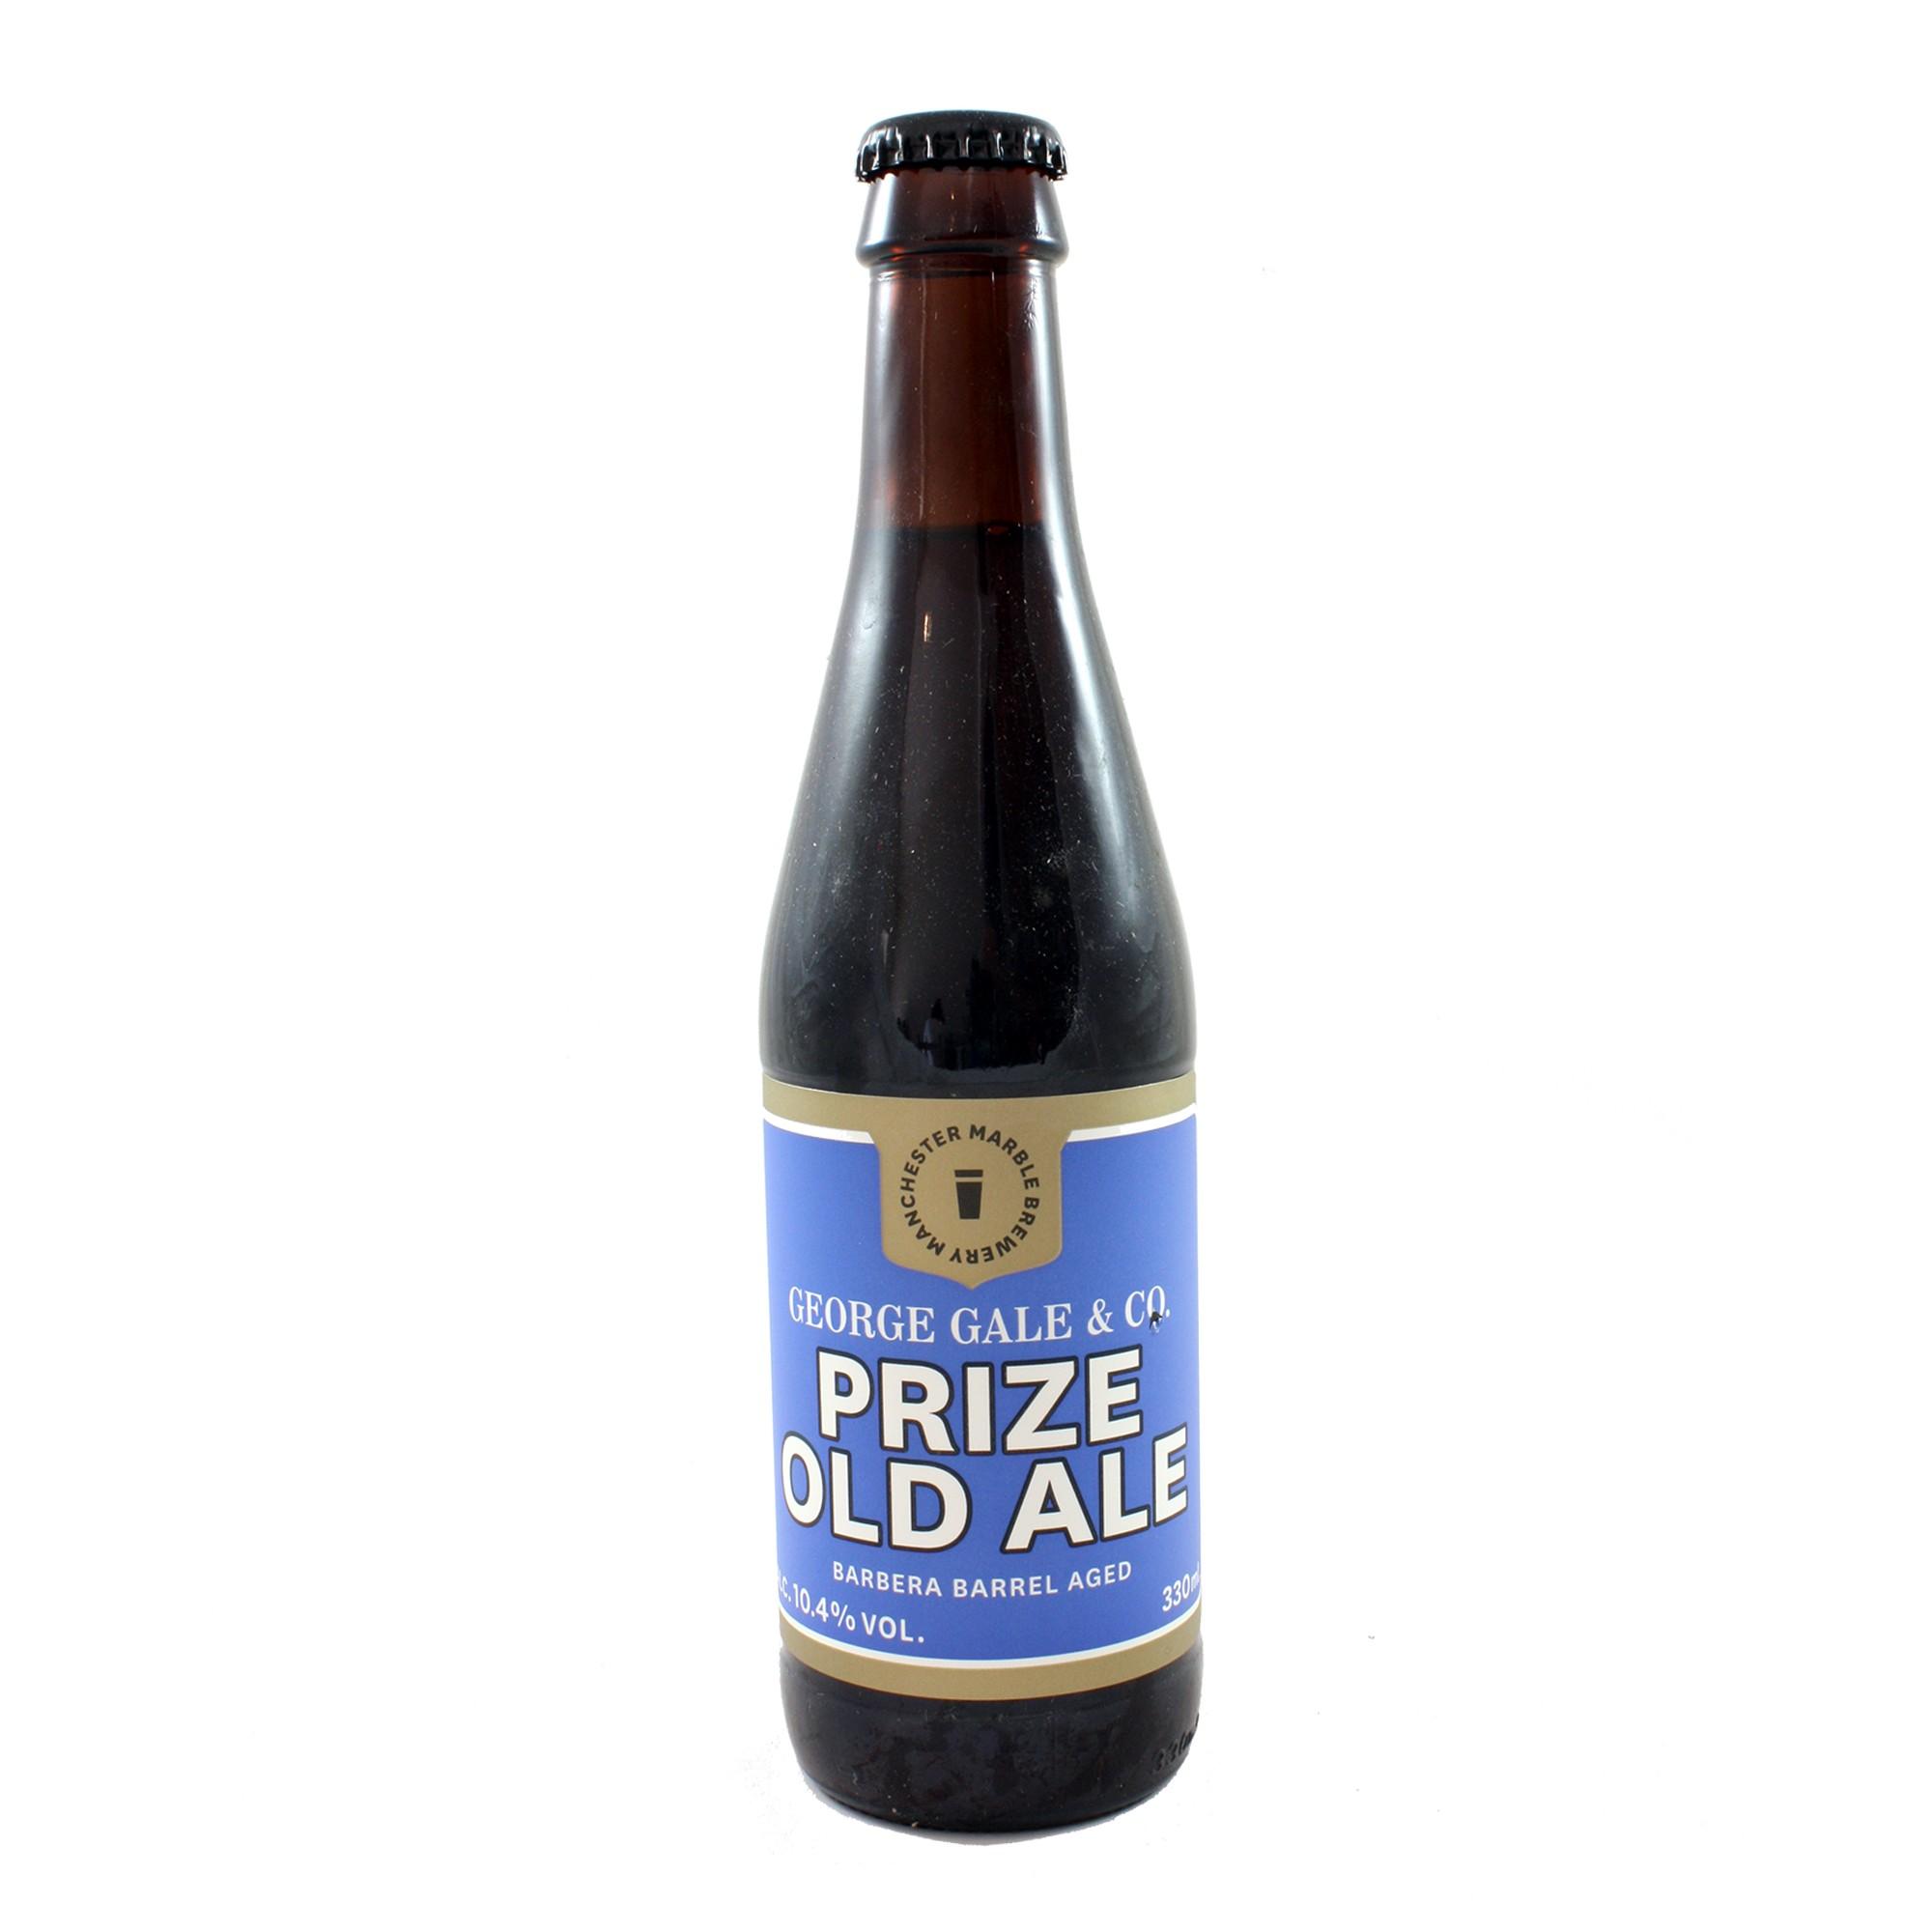 Gale's Prize Old Ale Barbera Barrel Aged 33 cl